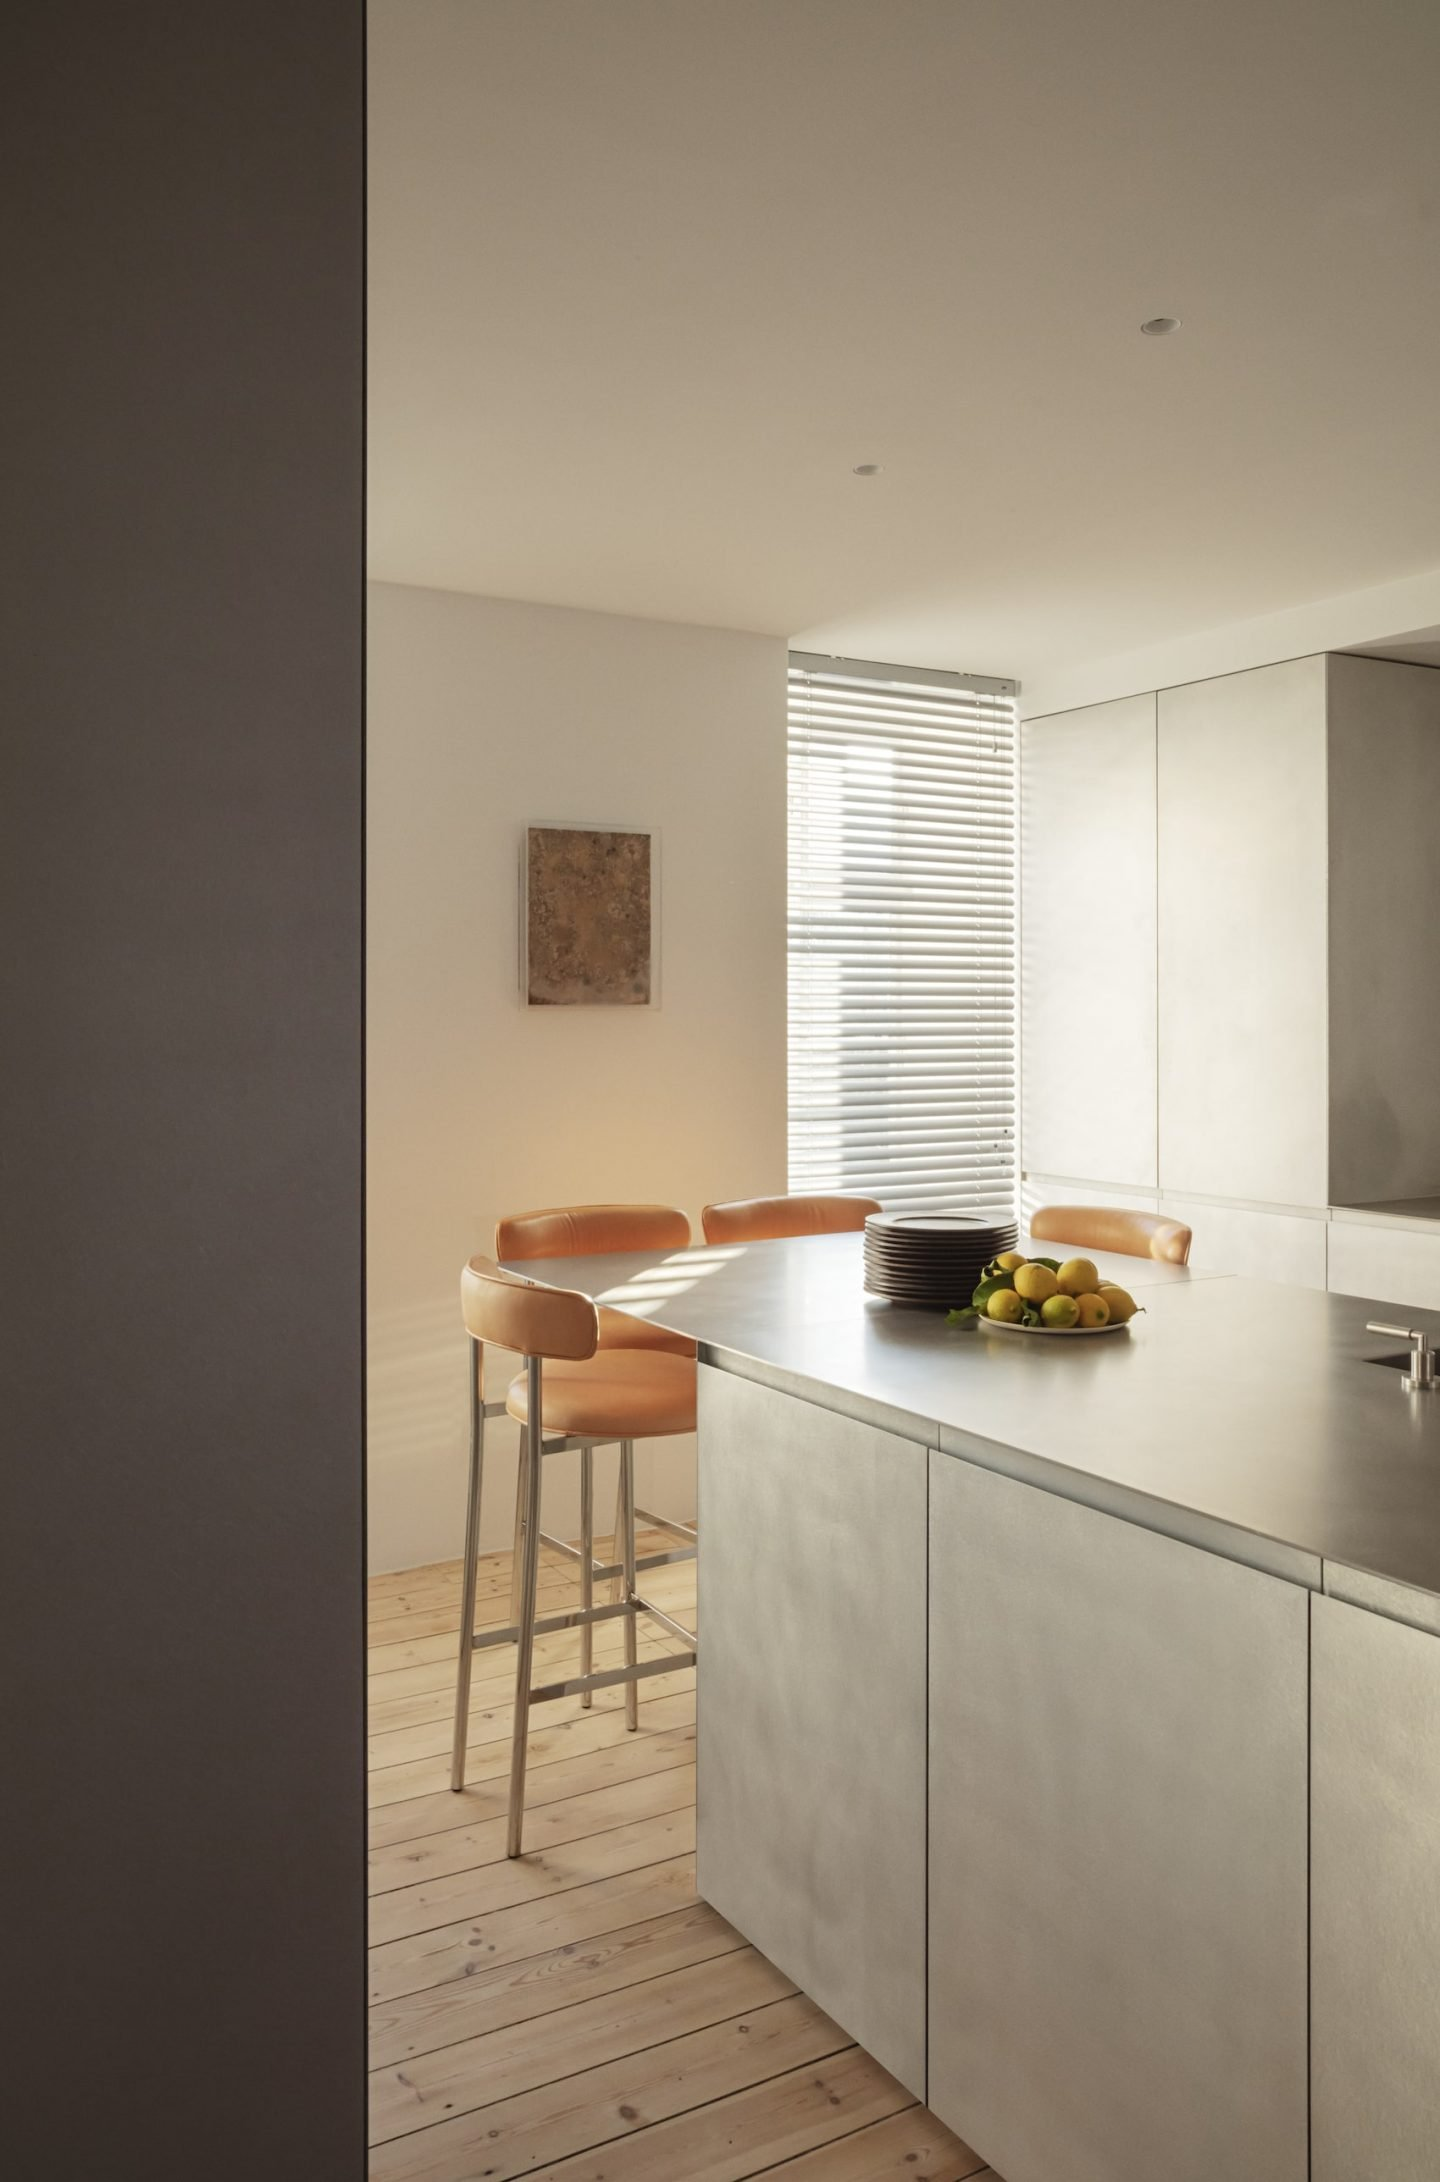 IGNANT-Design-David-Thulstrup-Studio-Visit-04